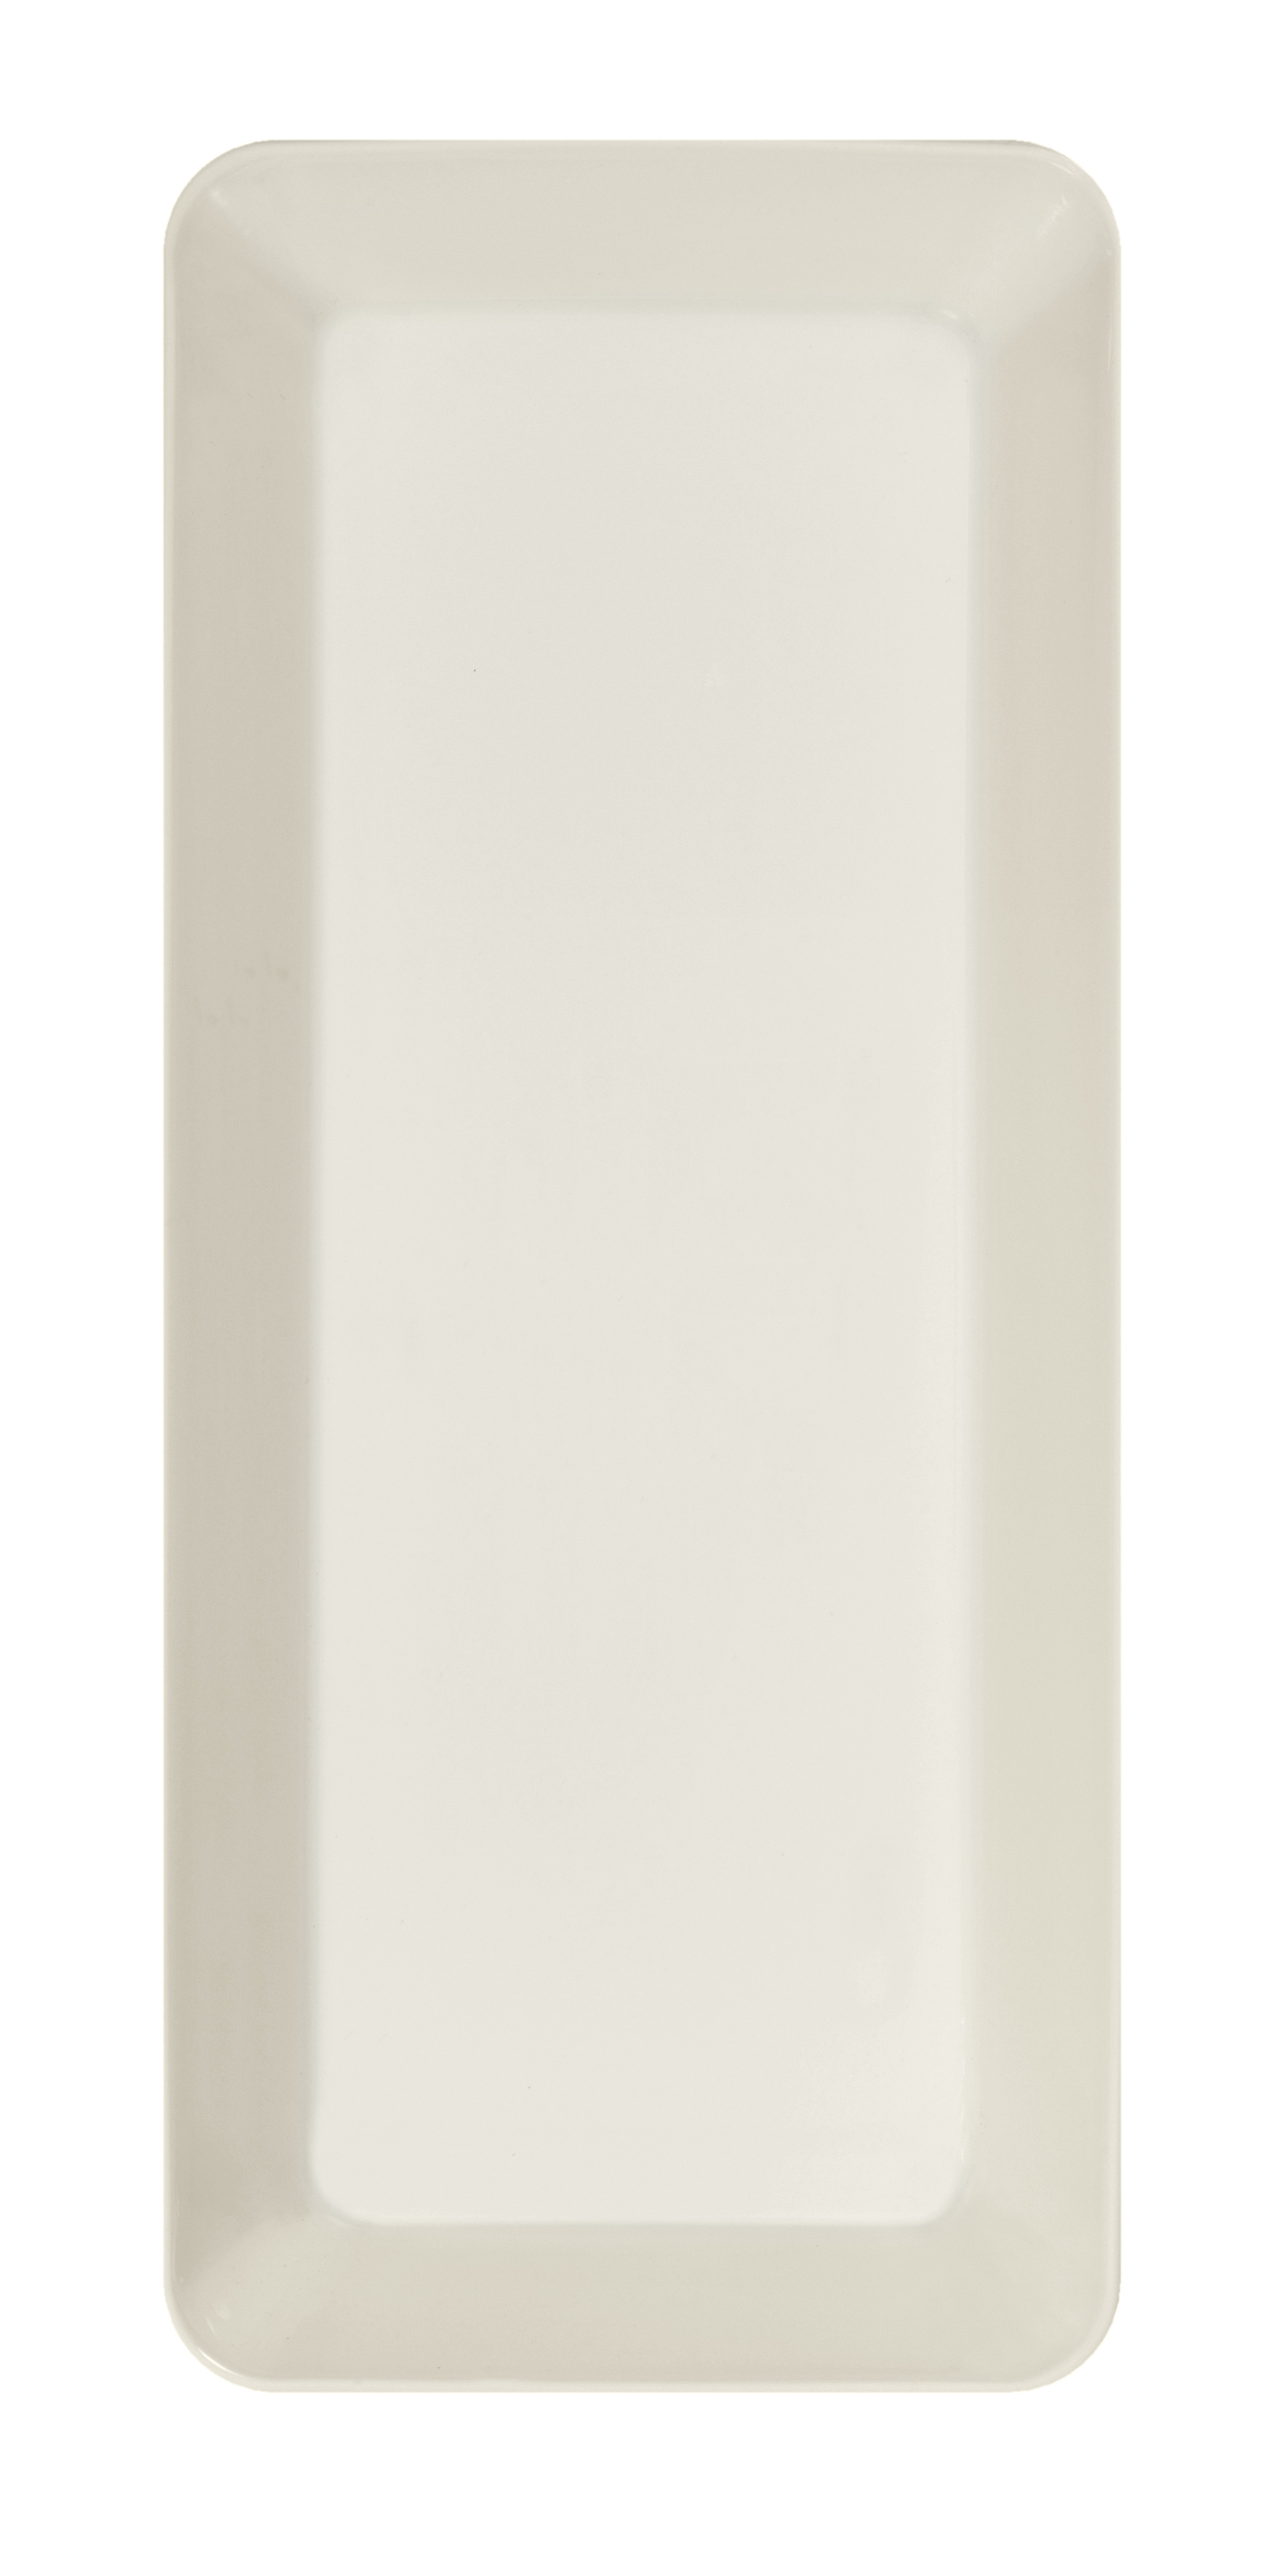 Iittala Teema Fat 16×37 cm Vit